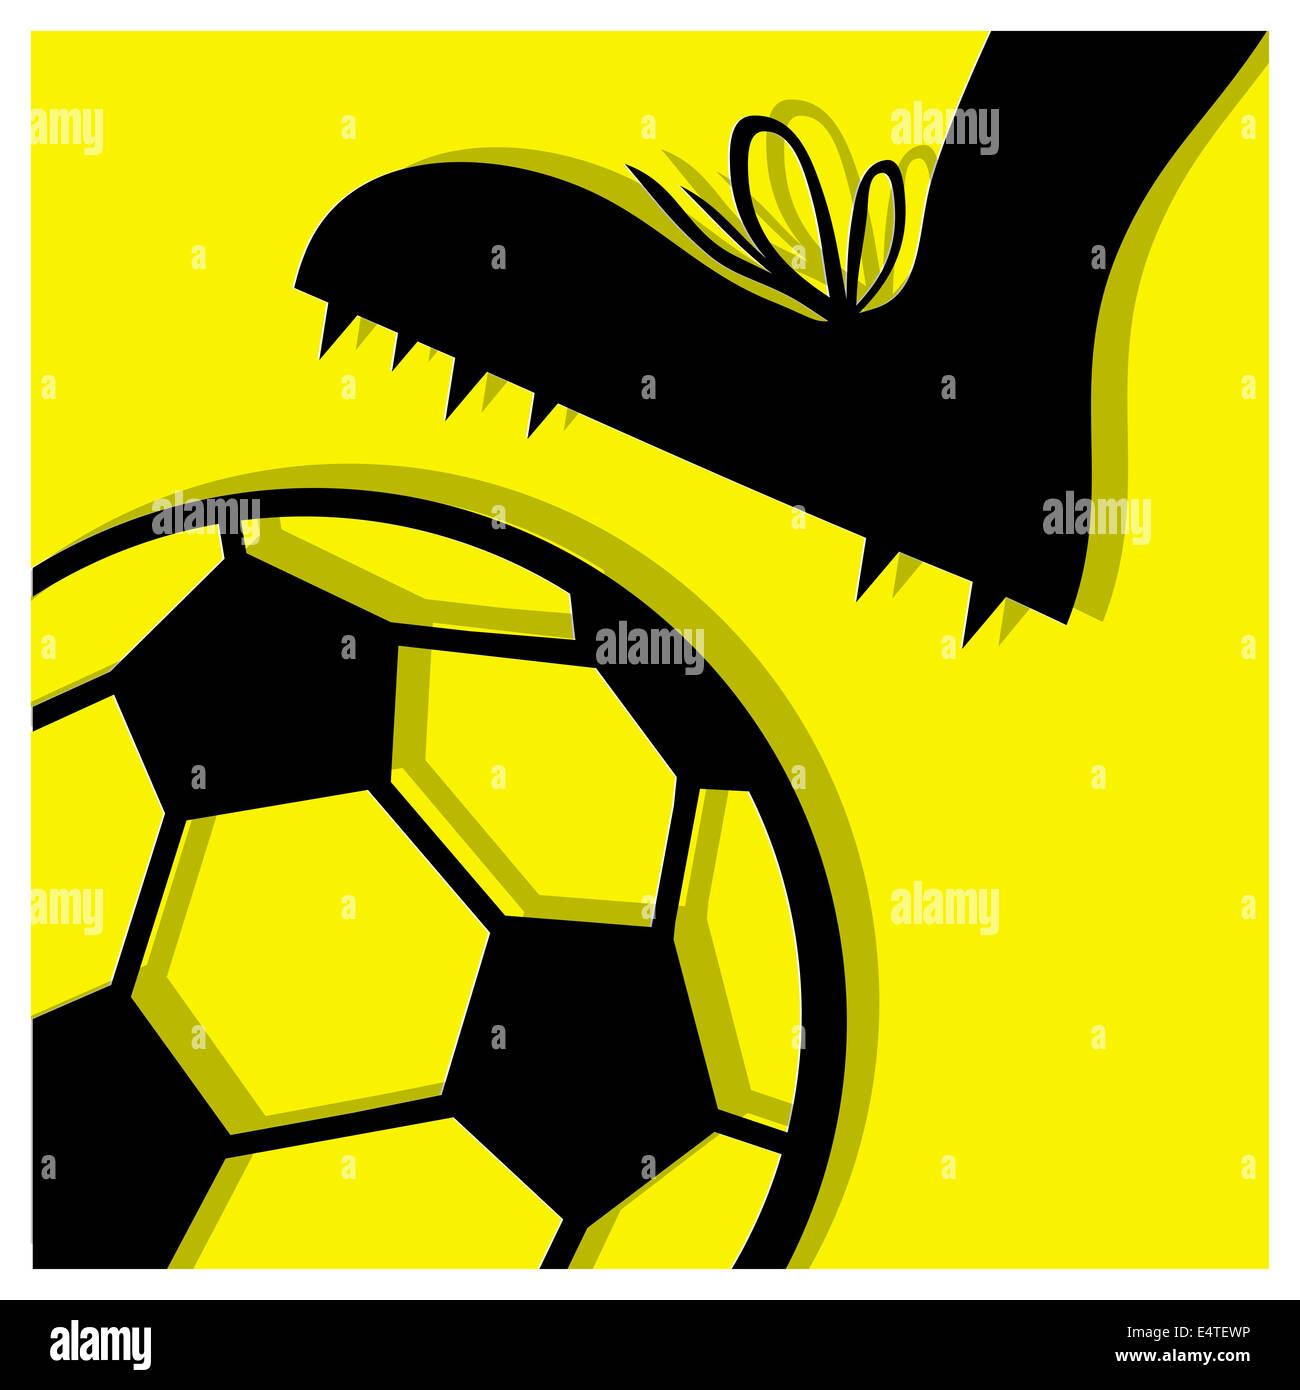 Fußball-Piktogramm gelb Stockbild